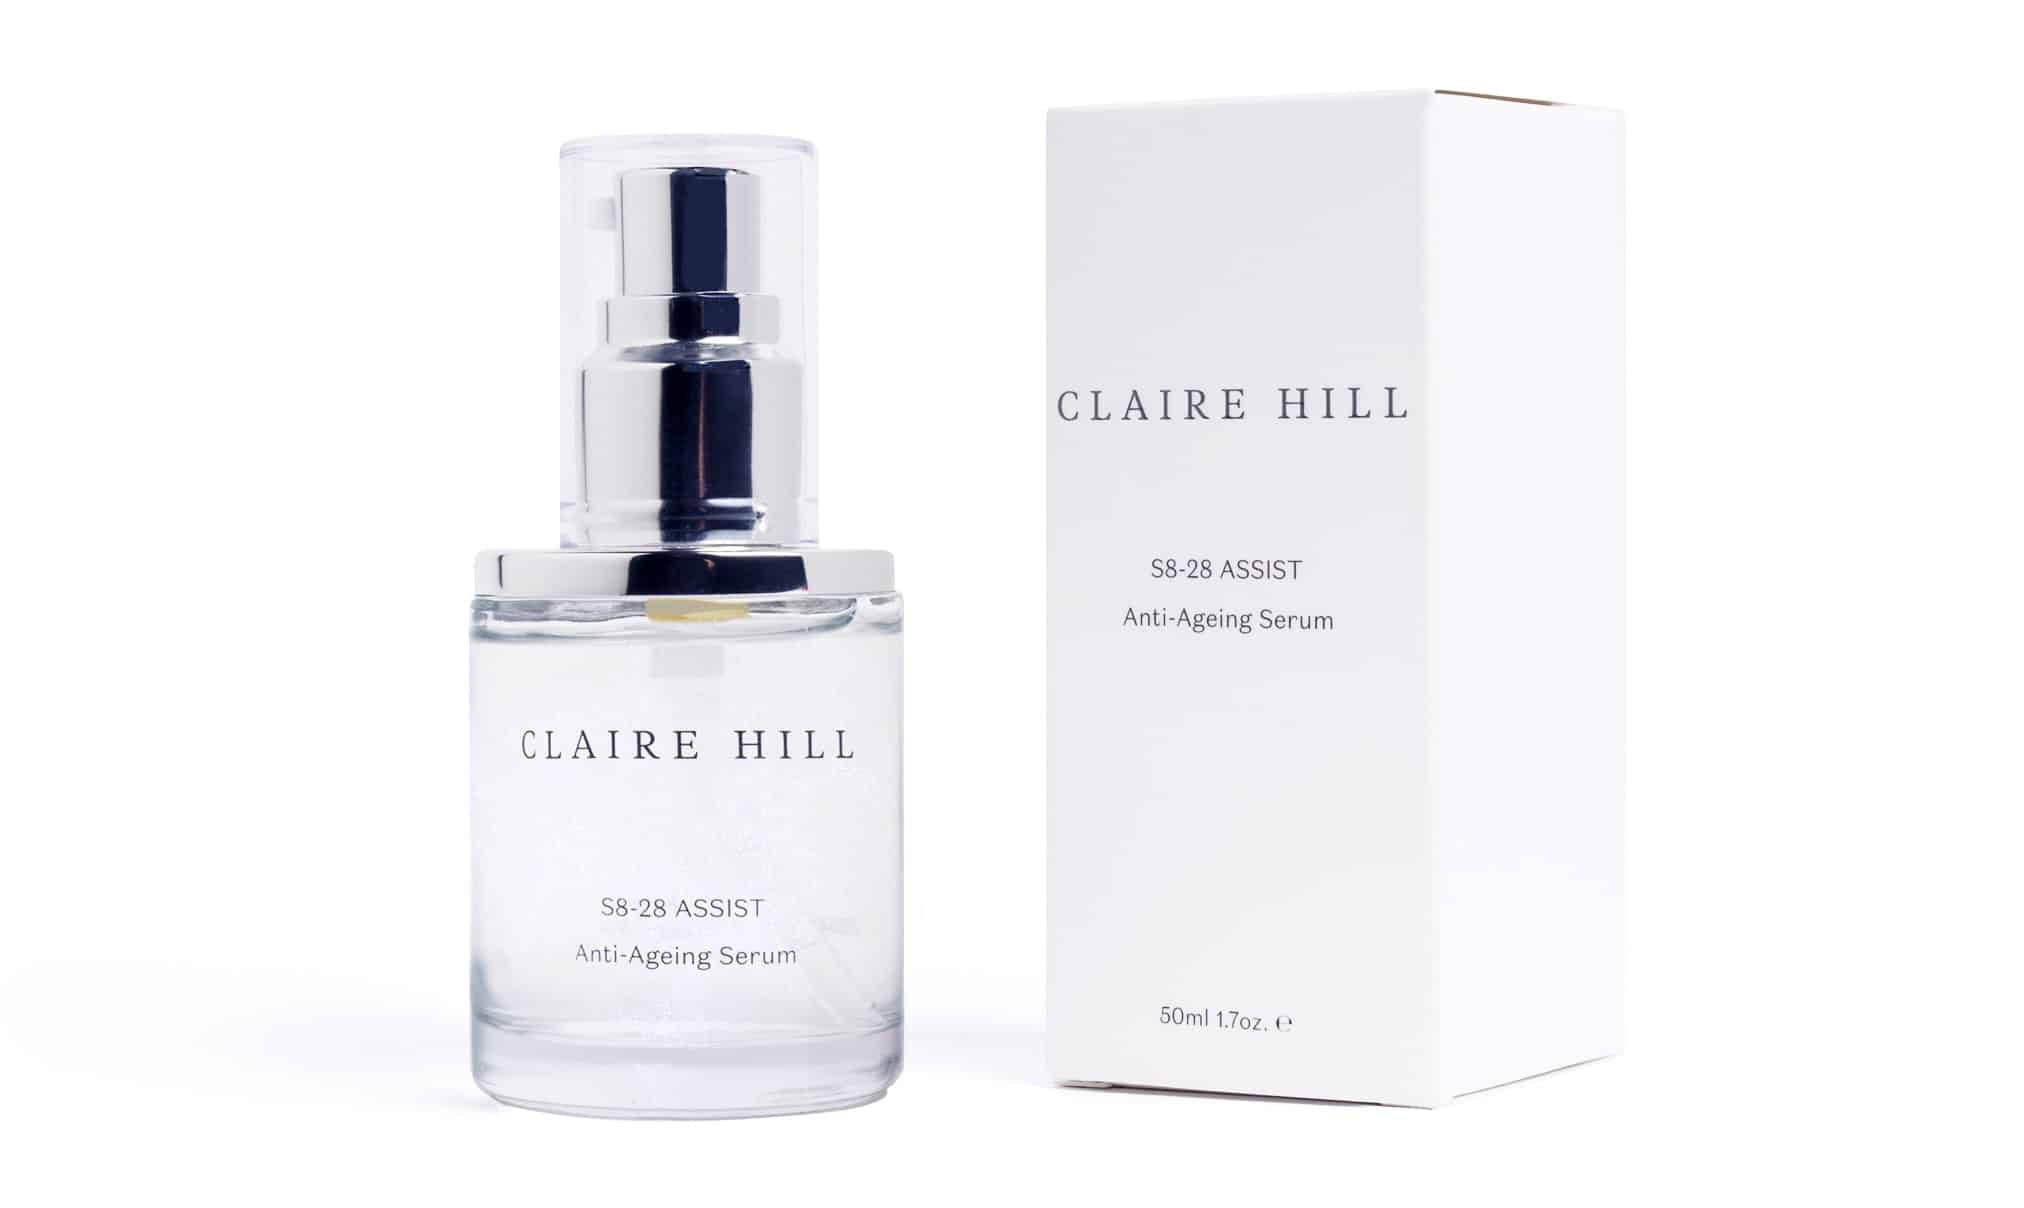 Claire Hill S8-28 Assist Anti Age Serum